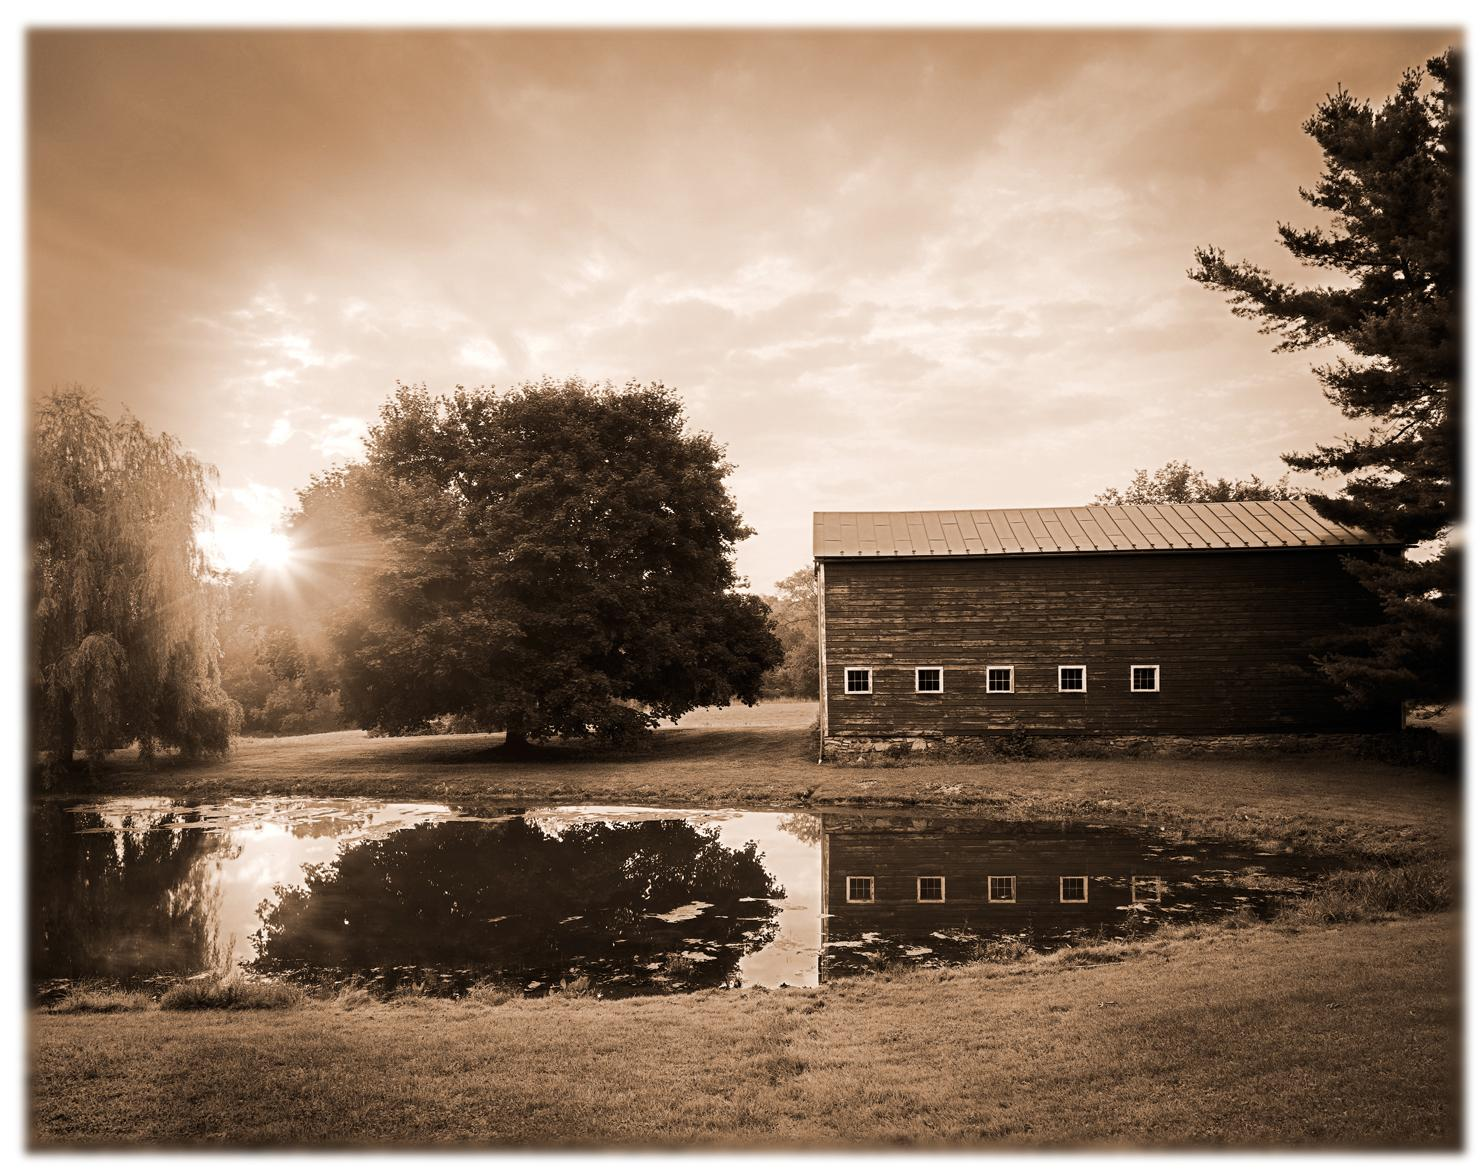 Kline Kill Road (Tranquil Landscape Photo of a Rustic Barn in Sepia tone)